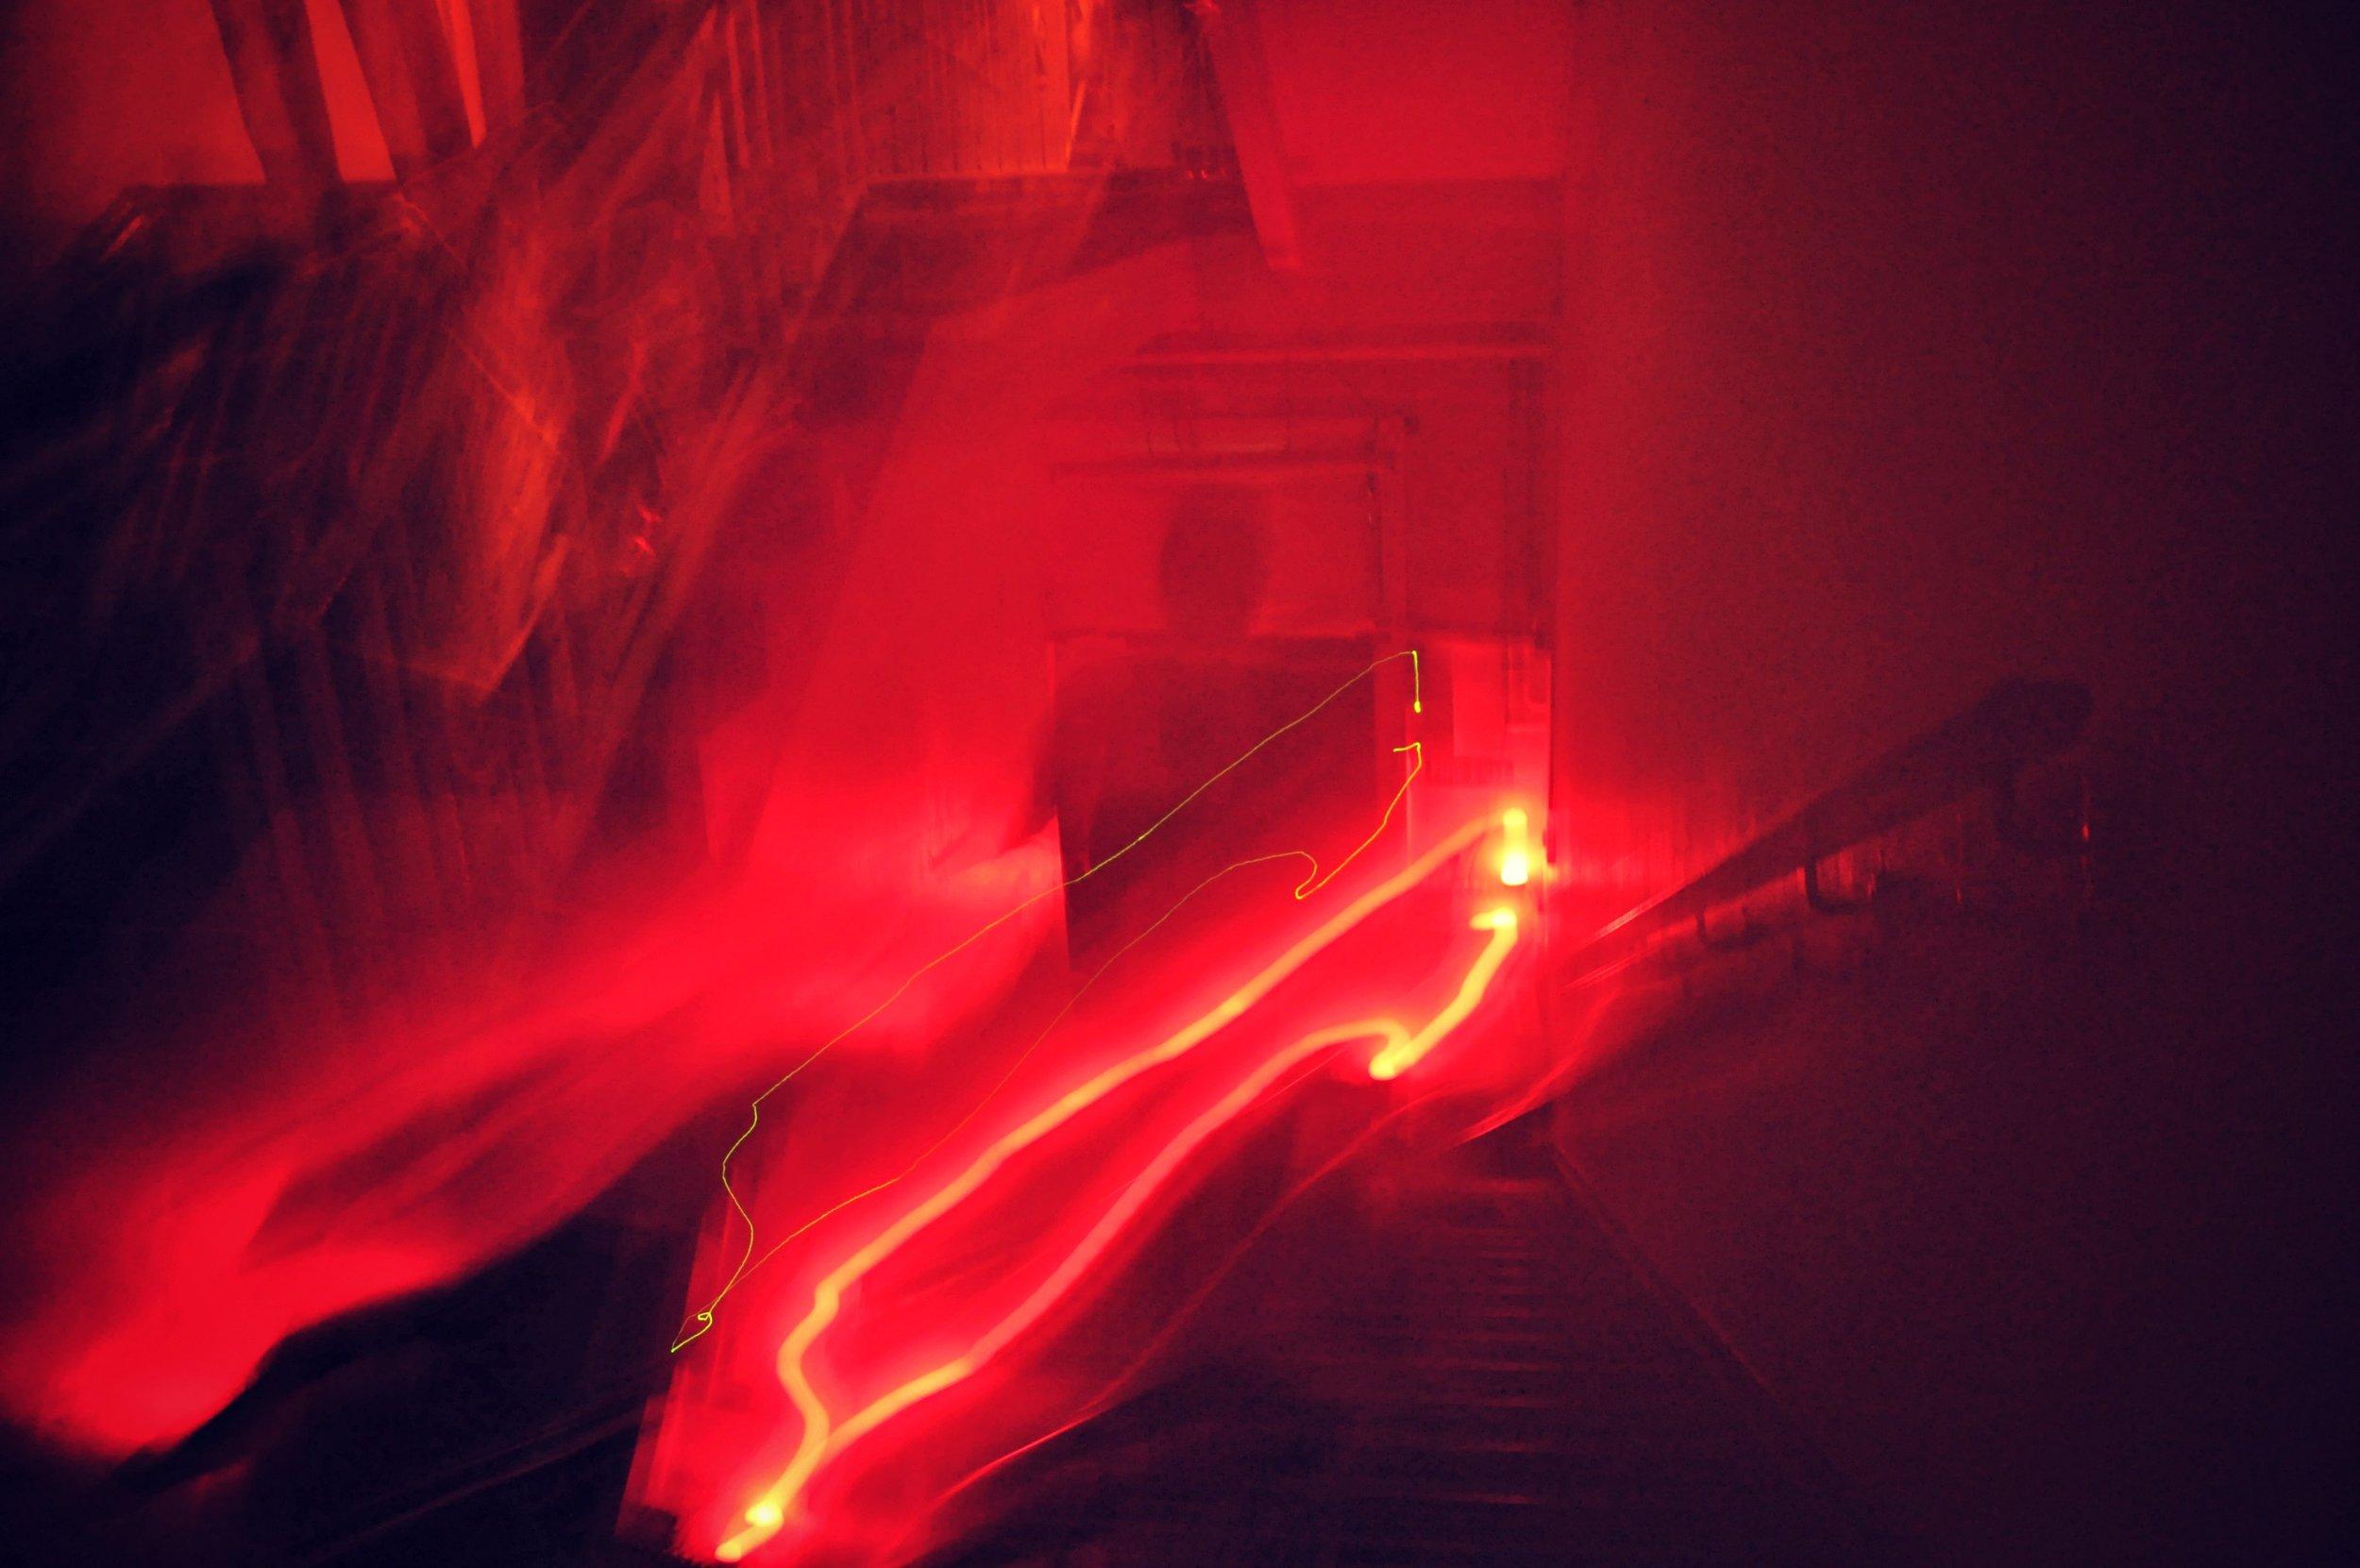 Still from Artist Charlie Murphy's 'Safe Light' performance at Tempting Failure festival.